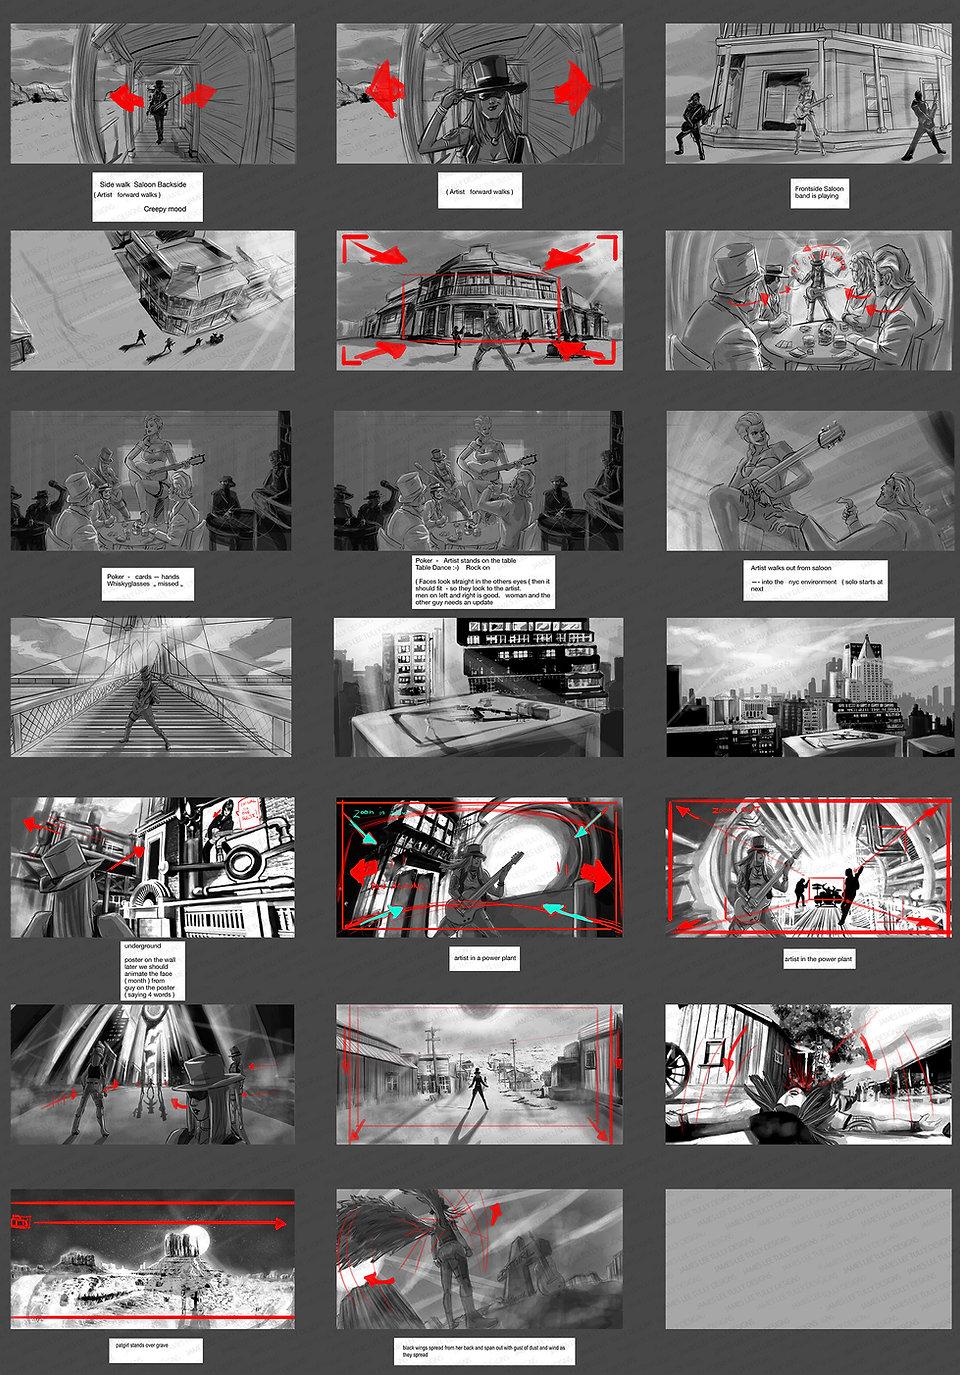 patgirl music video storyboard